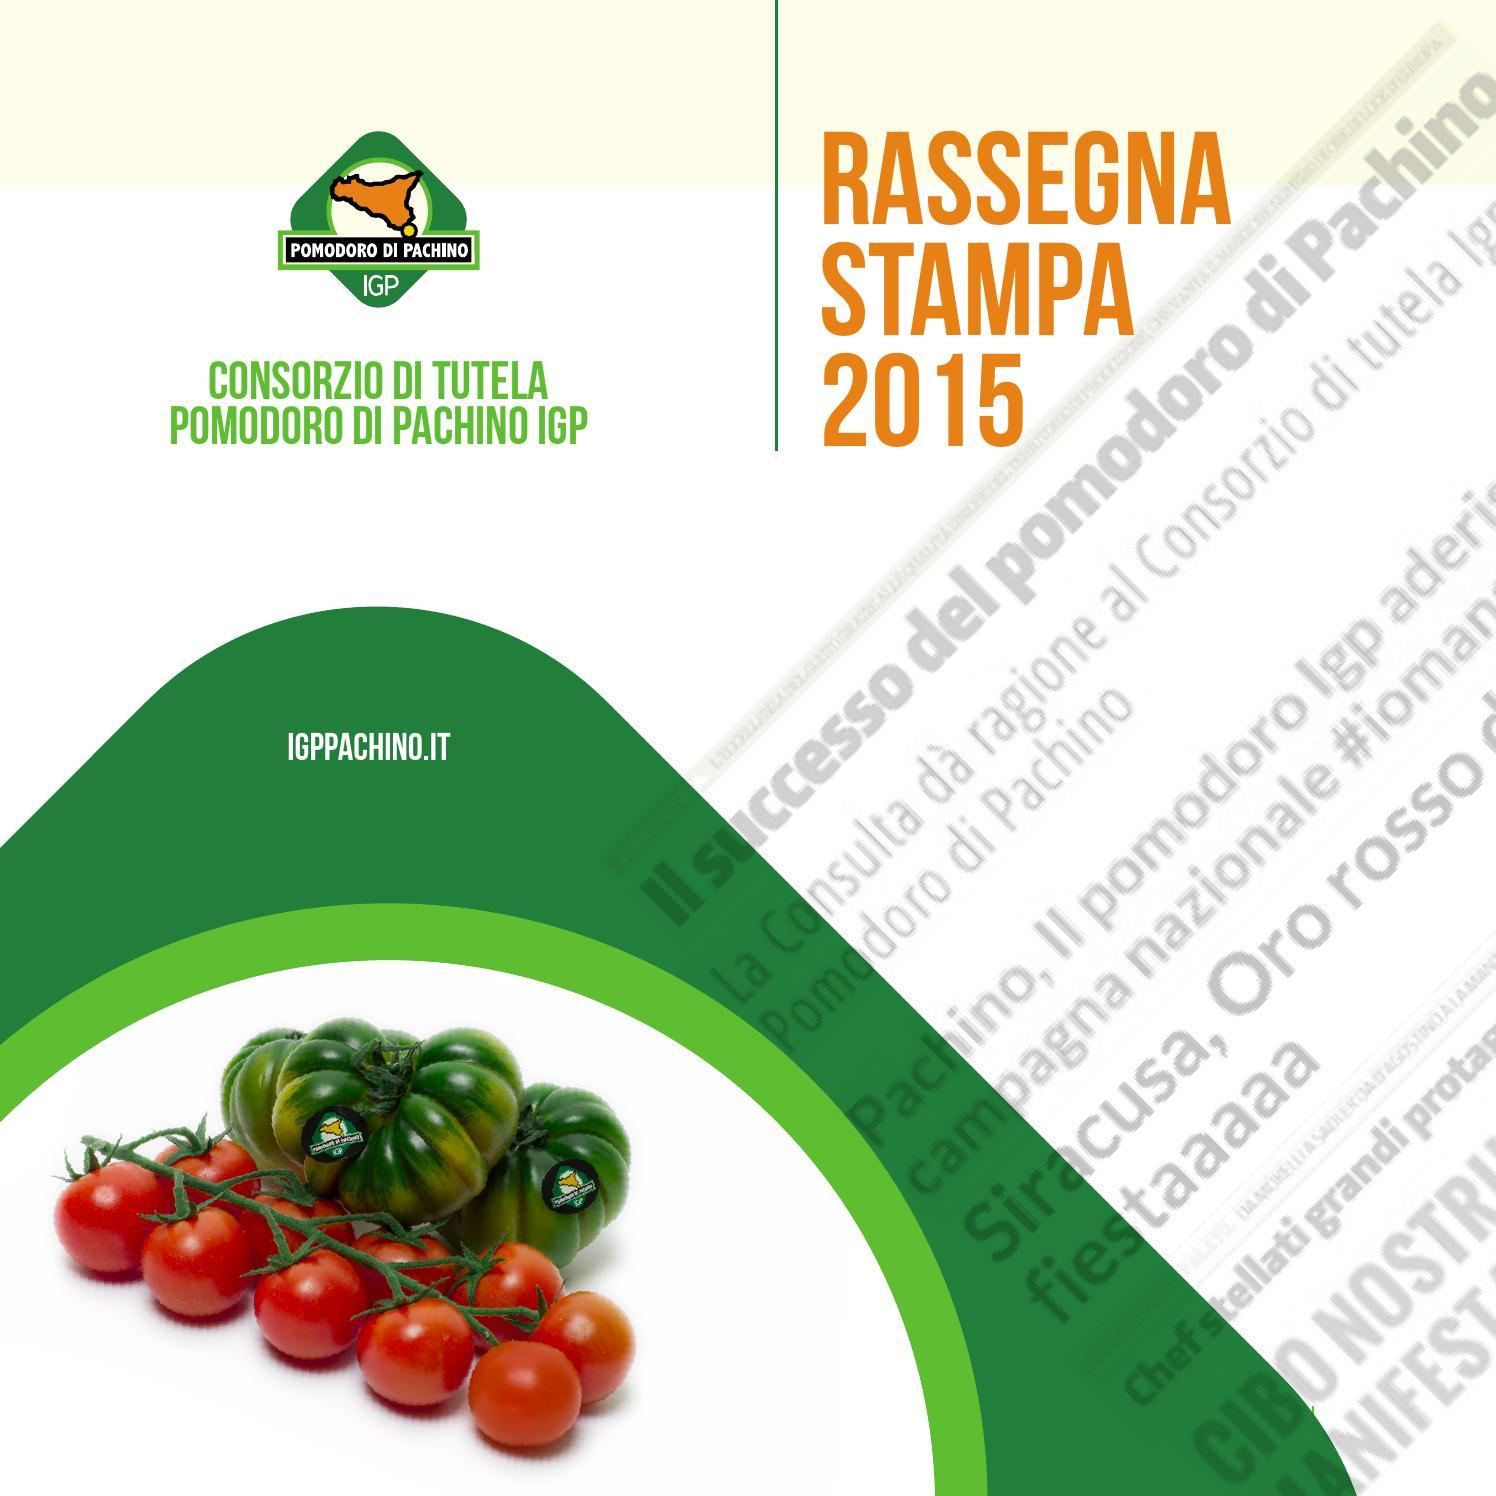 Rassegna stampa Consorzio di Tutela Pomodoro di Pachino Igp 2015 by Santina  Giannone - issuu 8253a3efd0d3